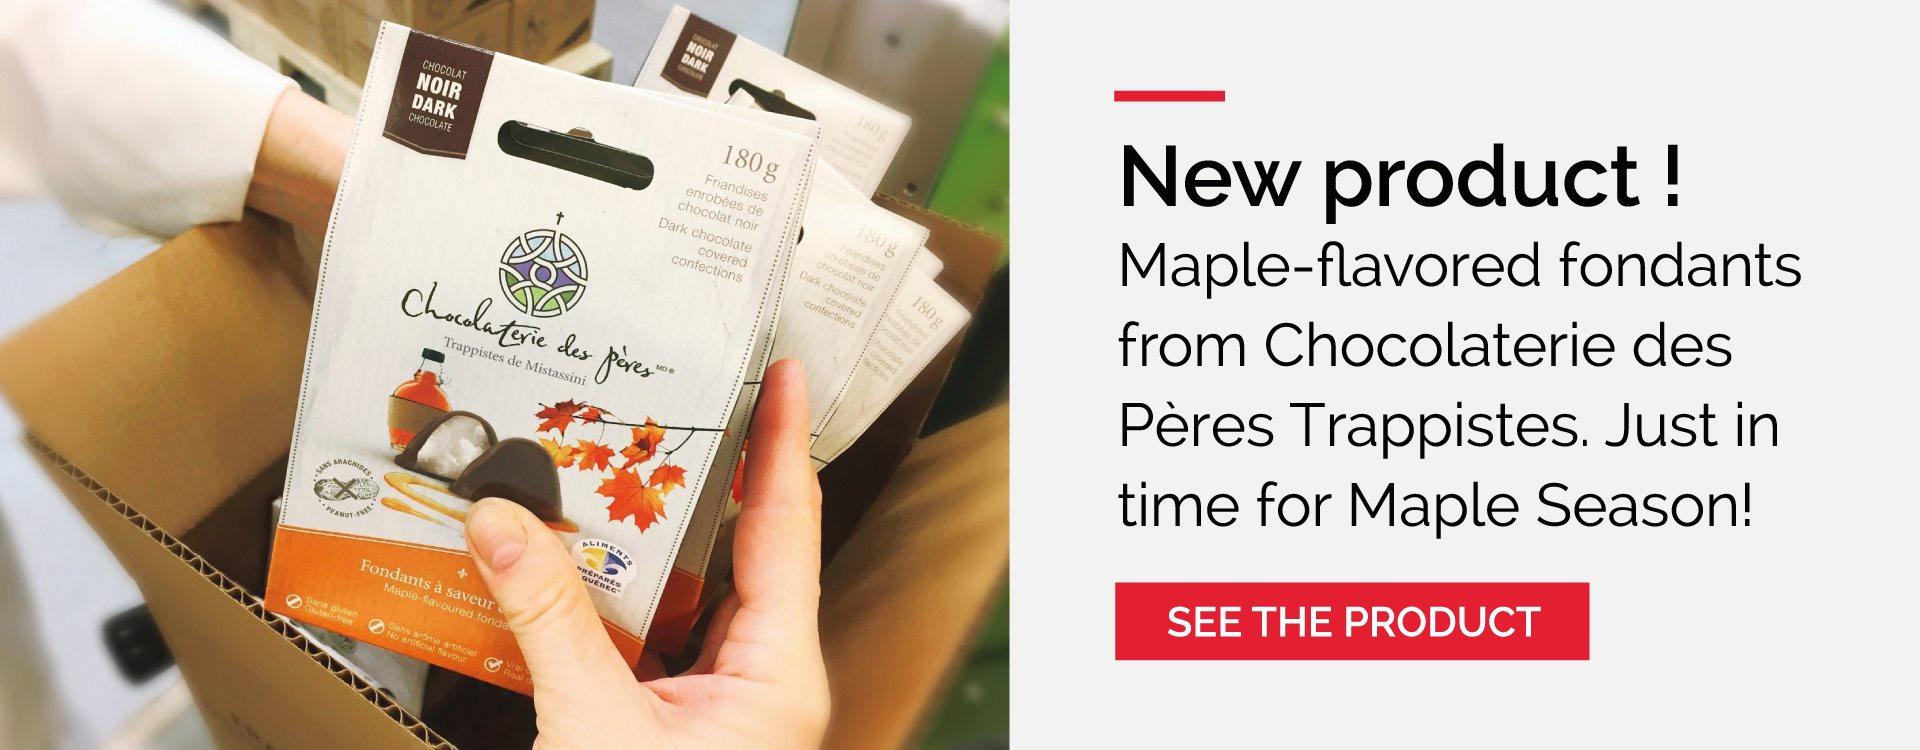 Maple fondants